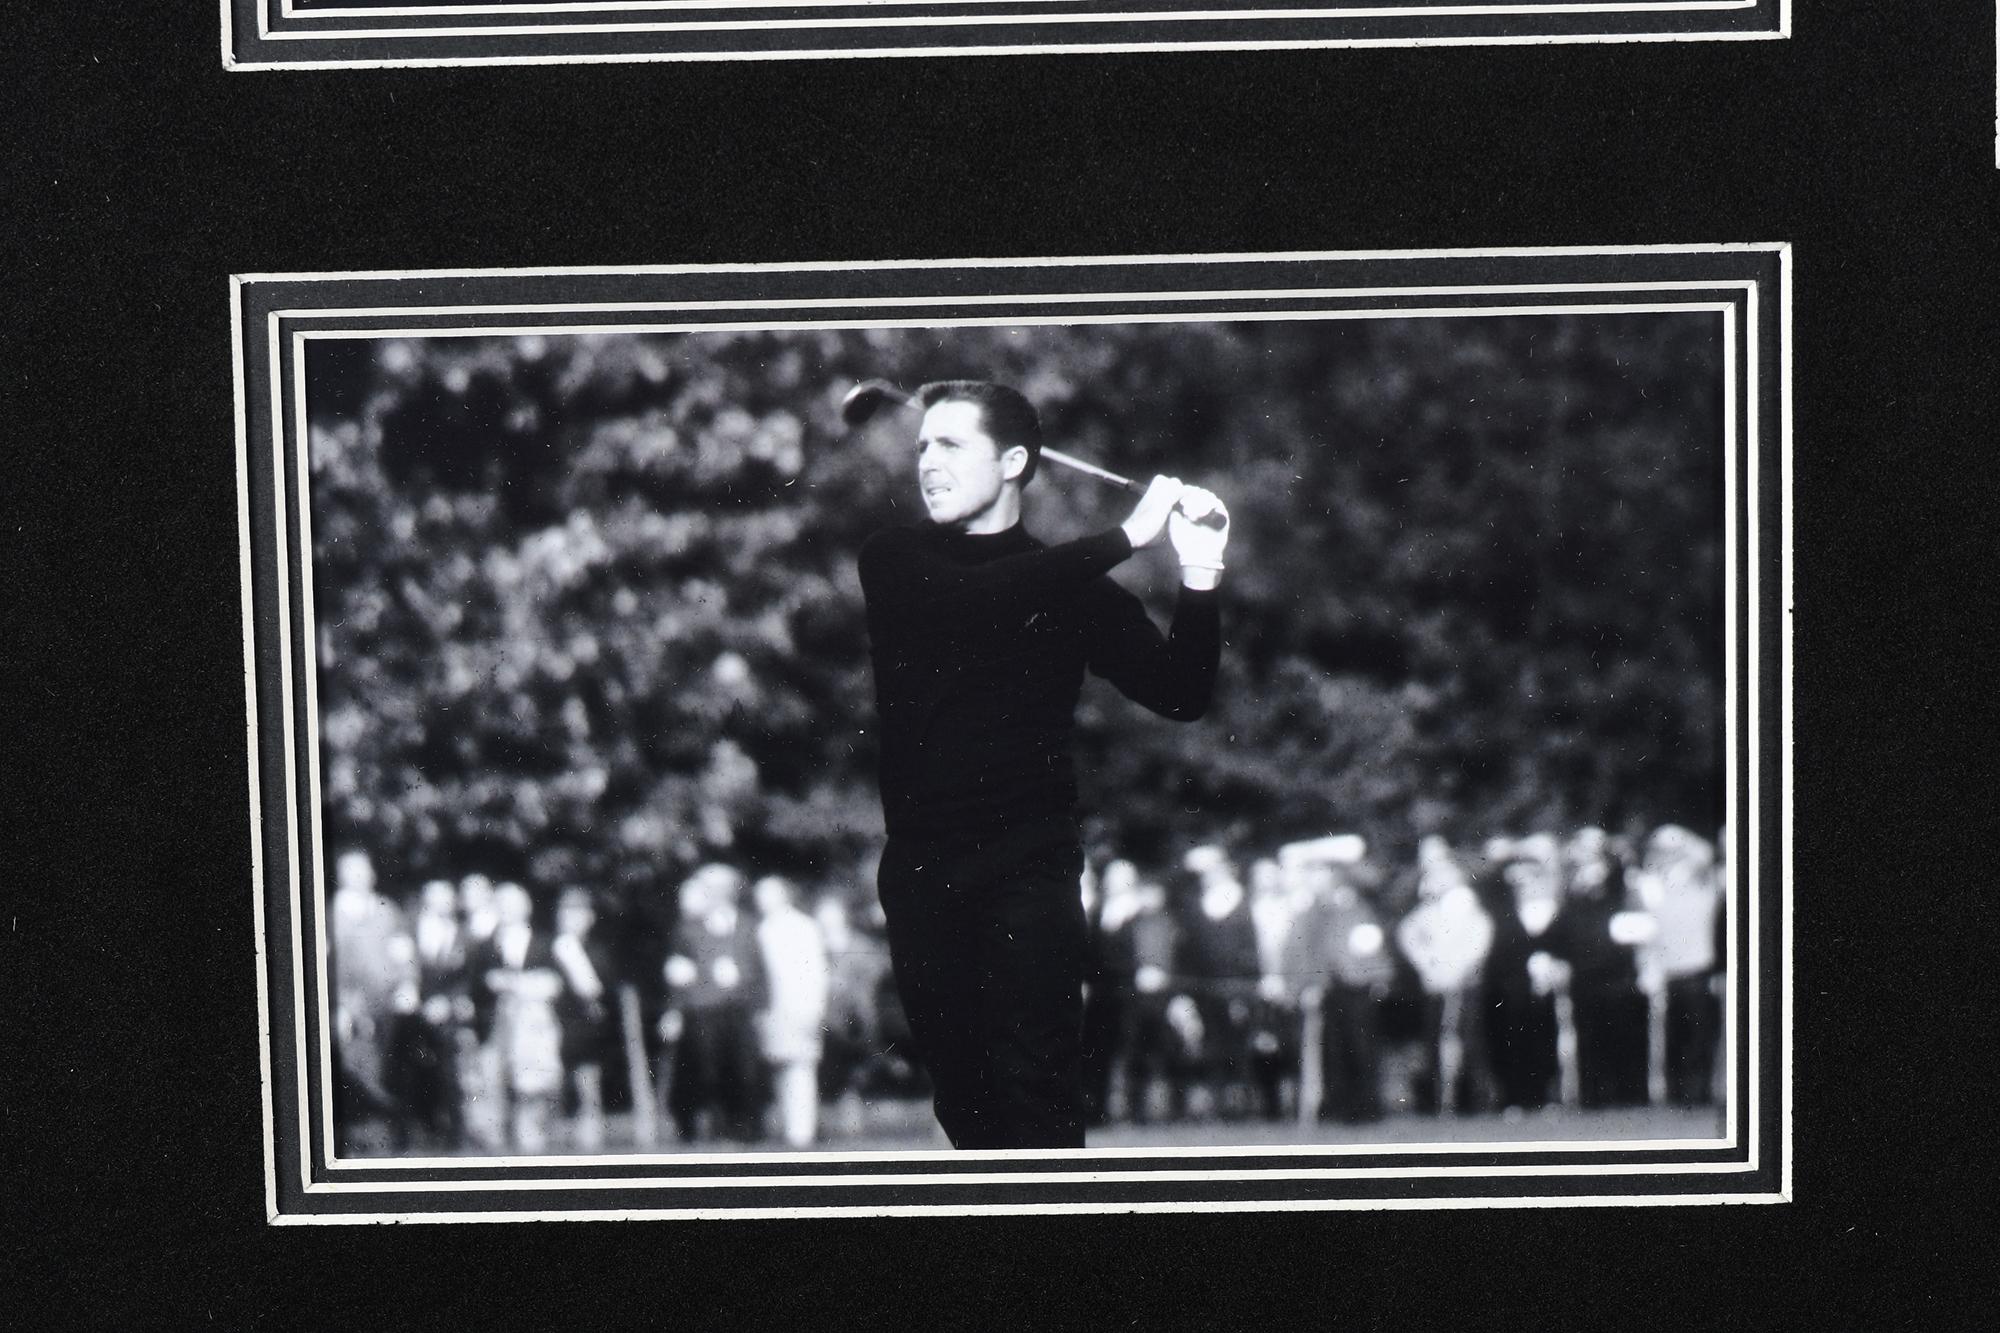 GARY PLAYER SIGNATURE PRESENTATION - Image 6 of 6